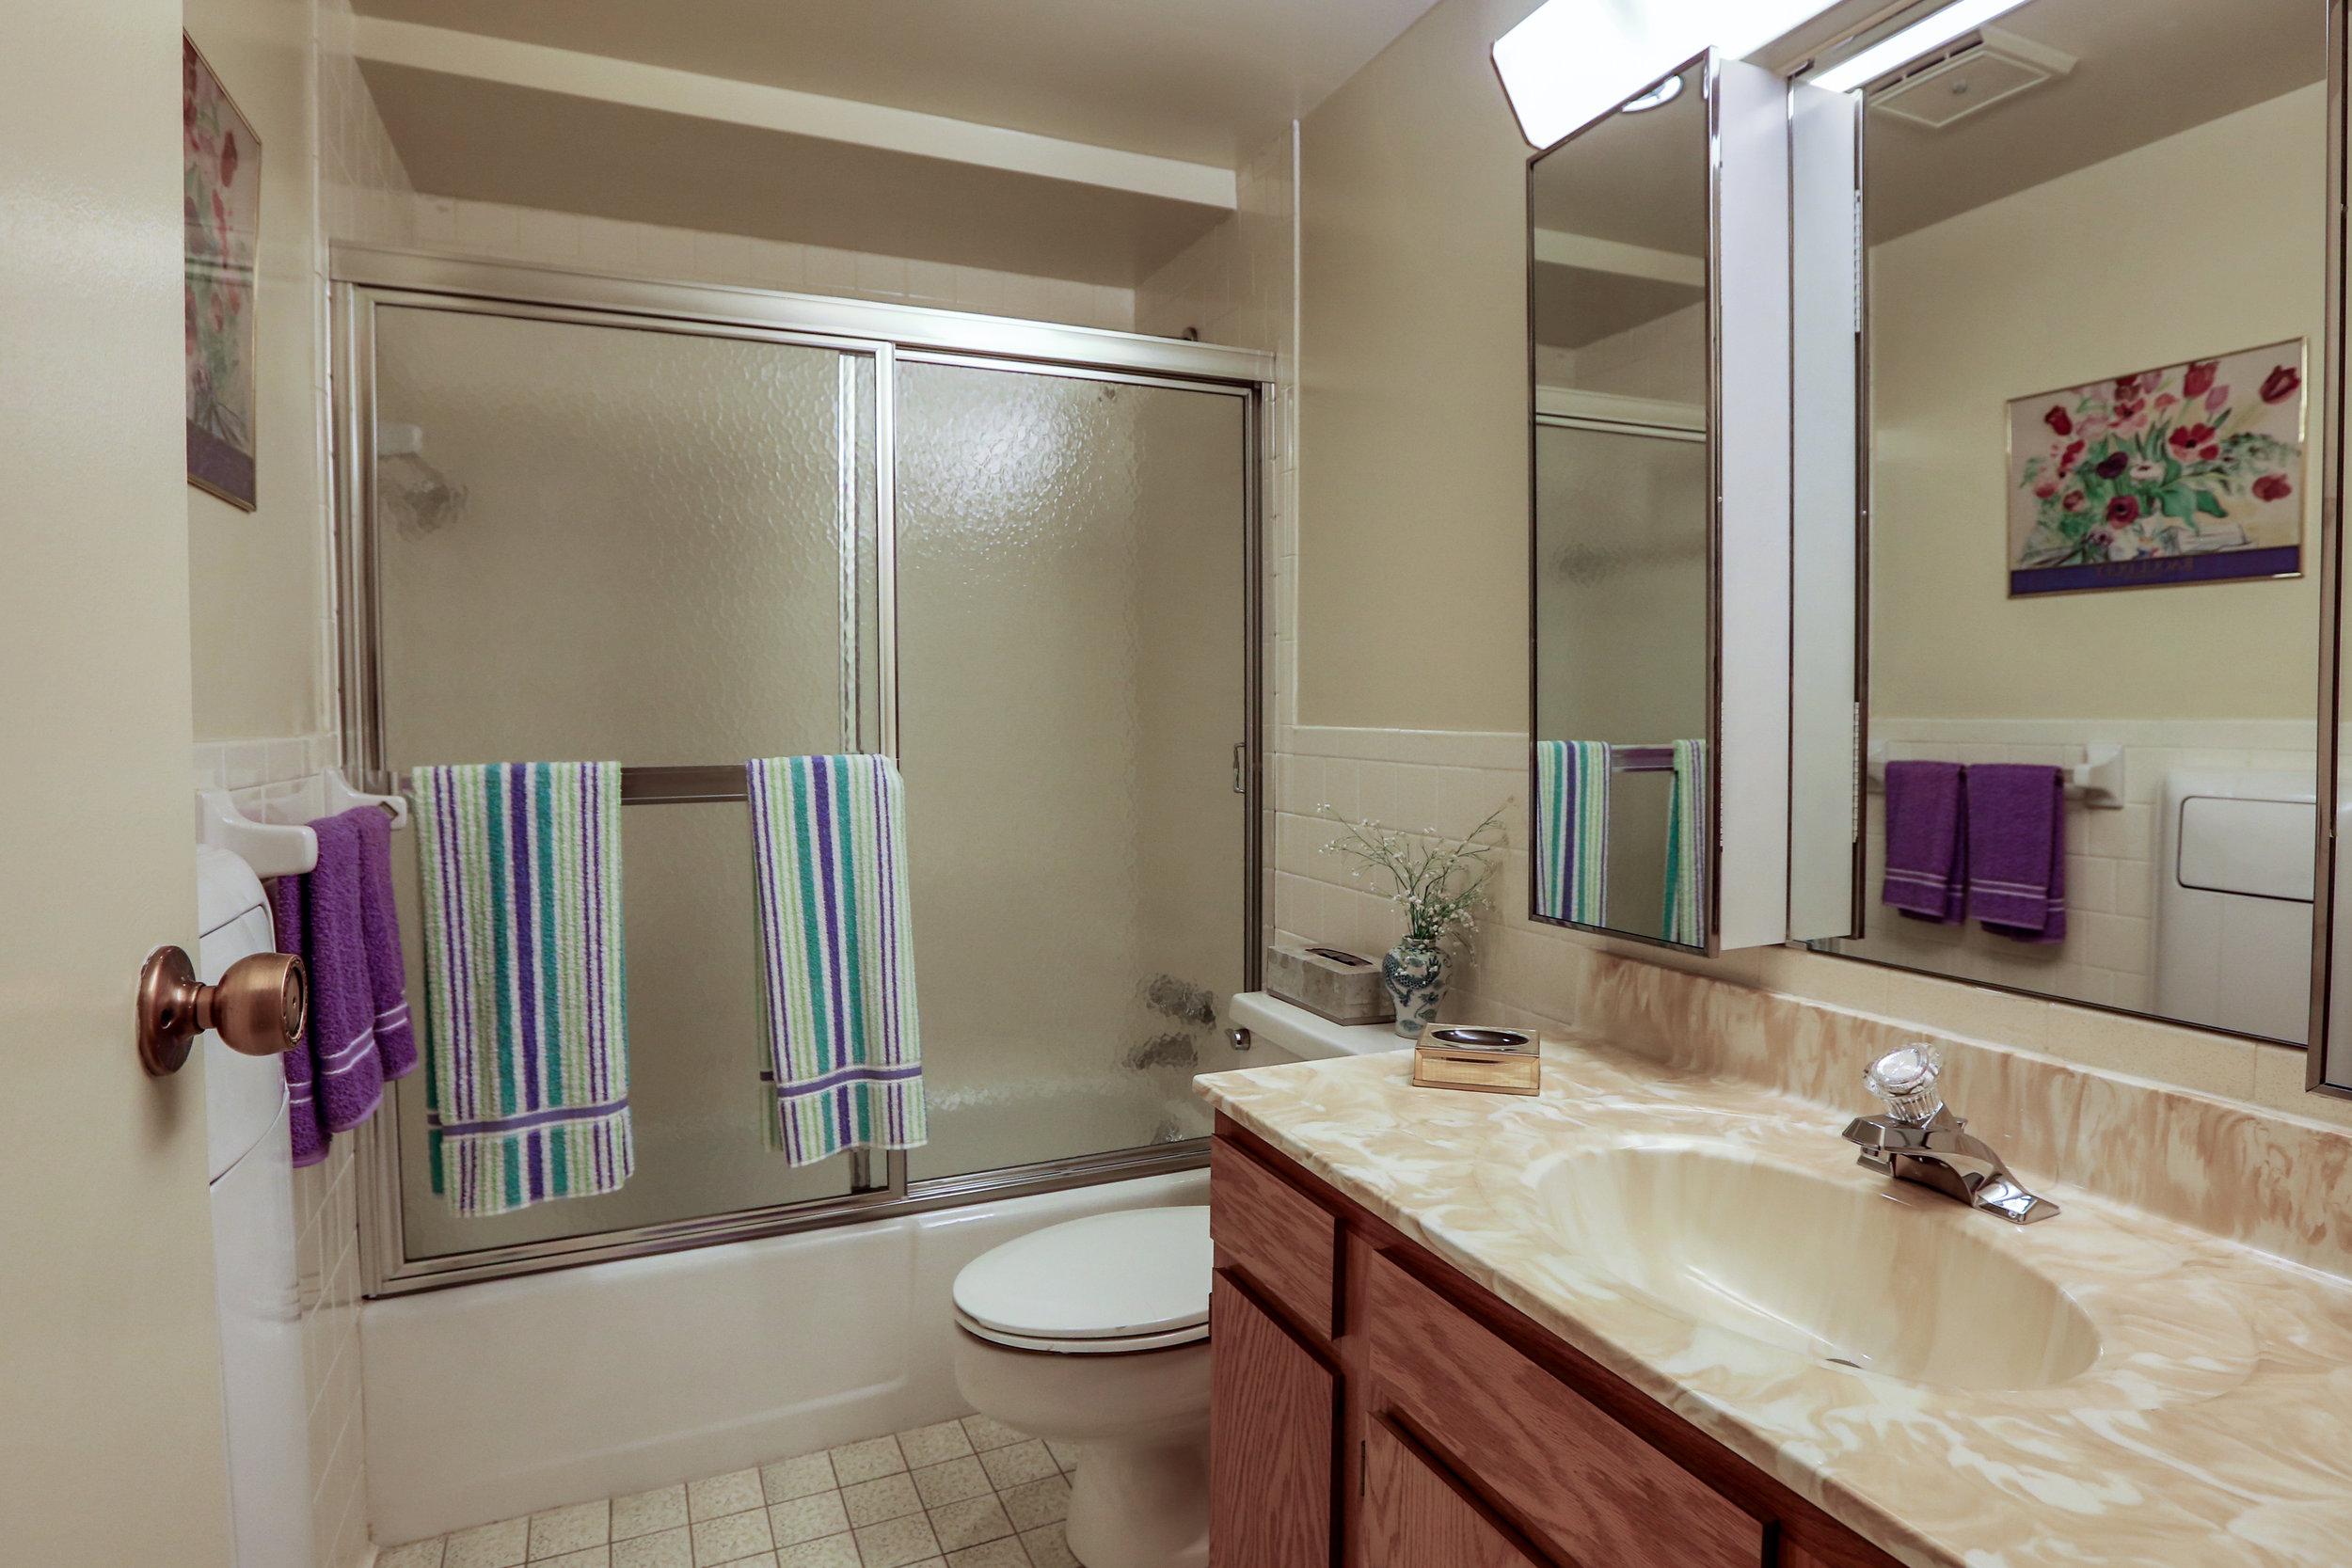 Classic Tiled Bathroom